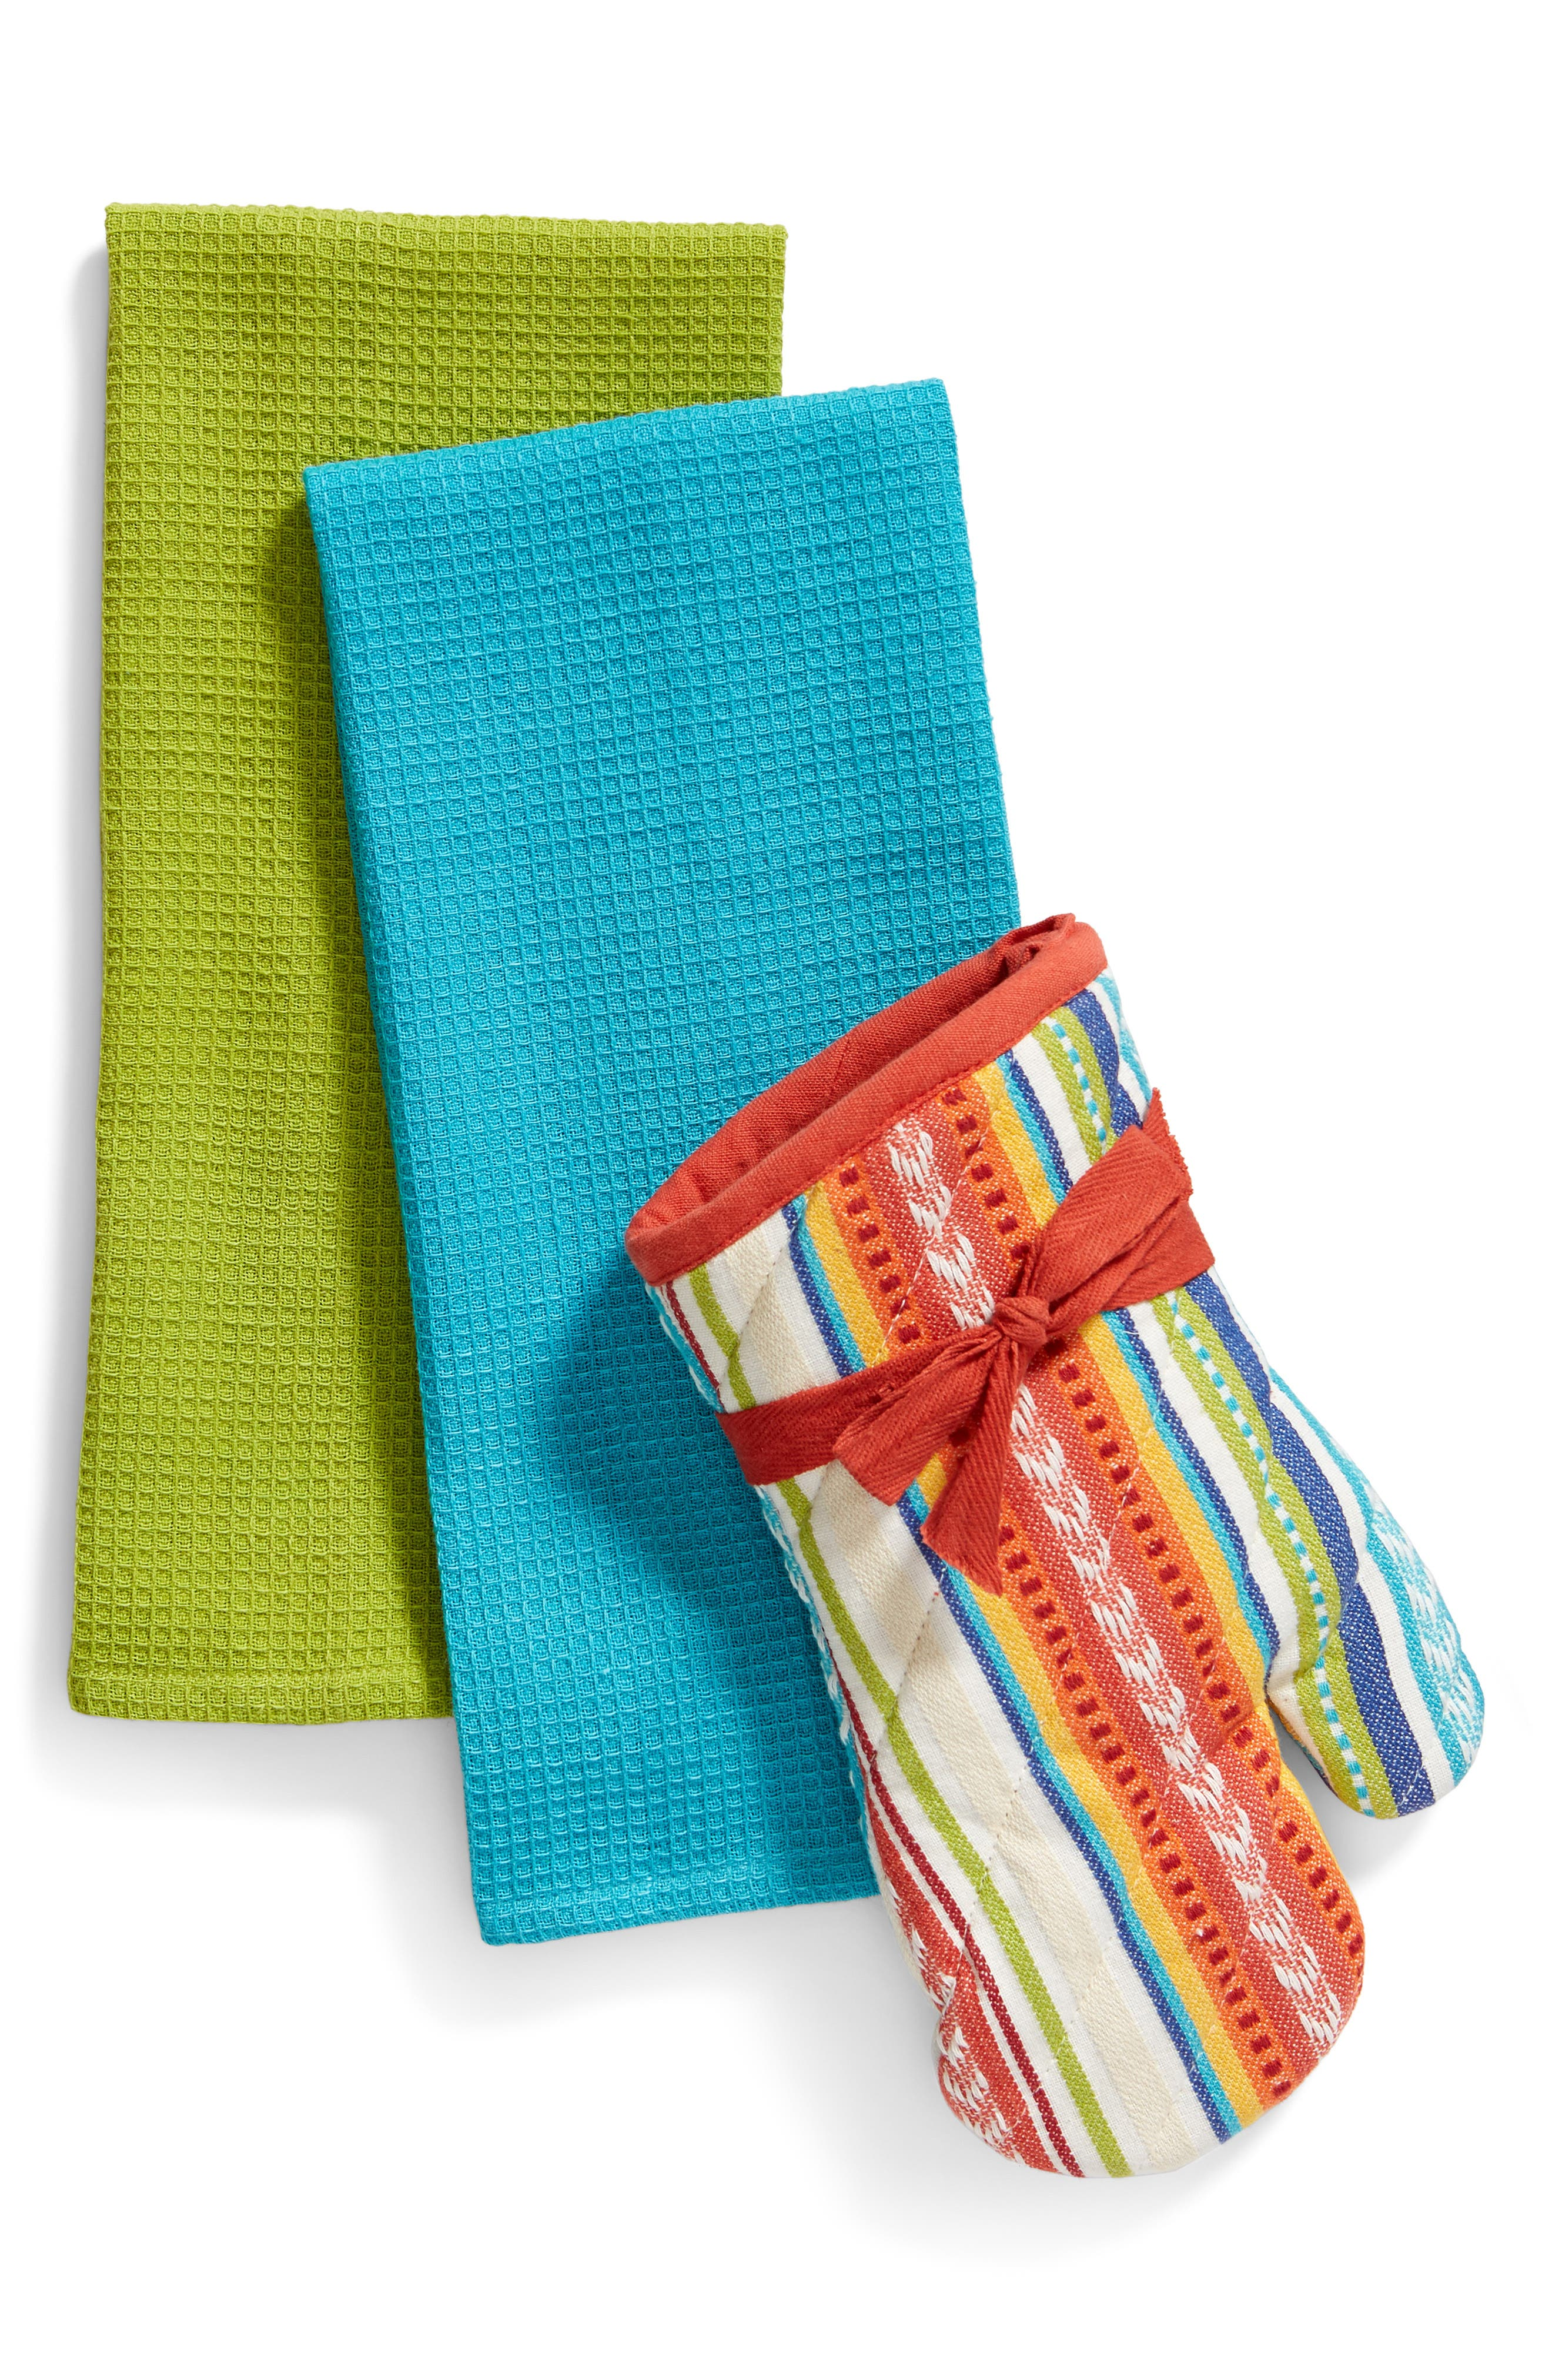 Baja Cantina Oven Mitt & Towel Set,                         Main,                         color, White